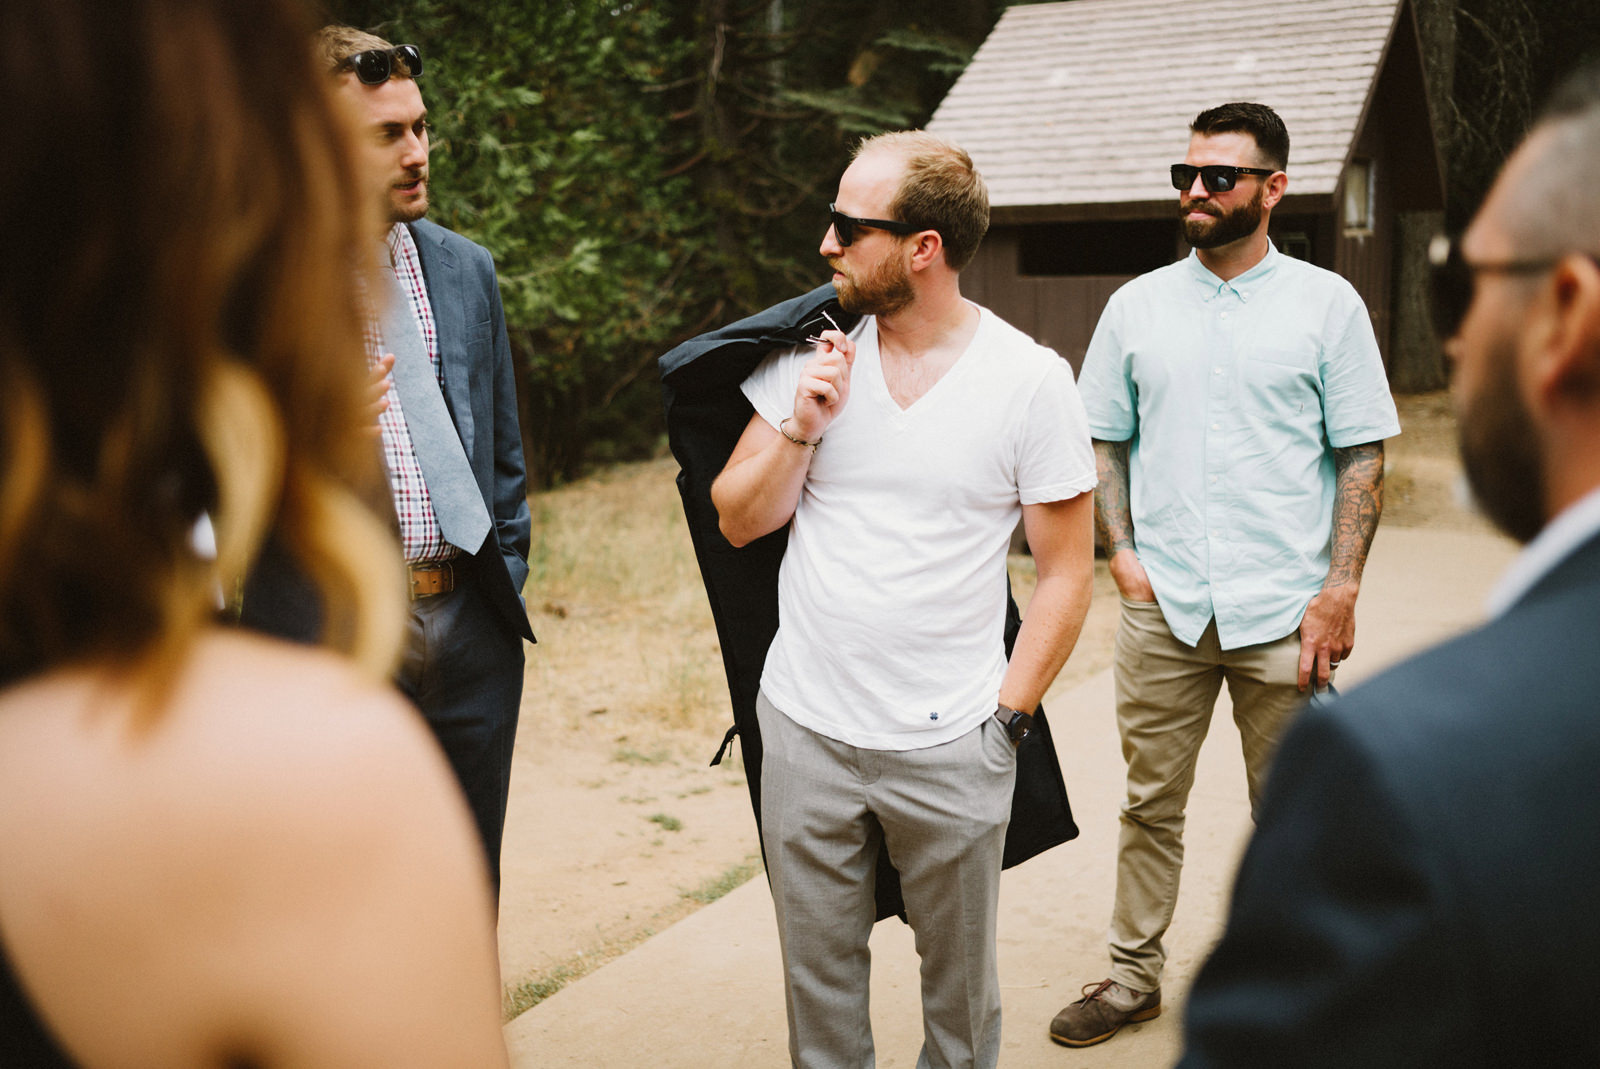 yosemite-intimate-wedding-023 YOSEMITE INTIMATE WEDDING